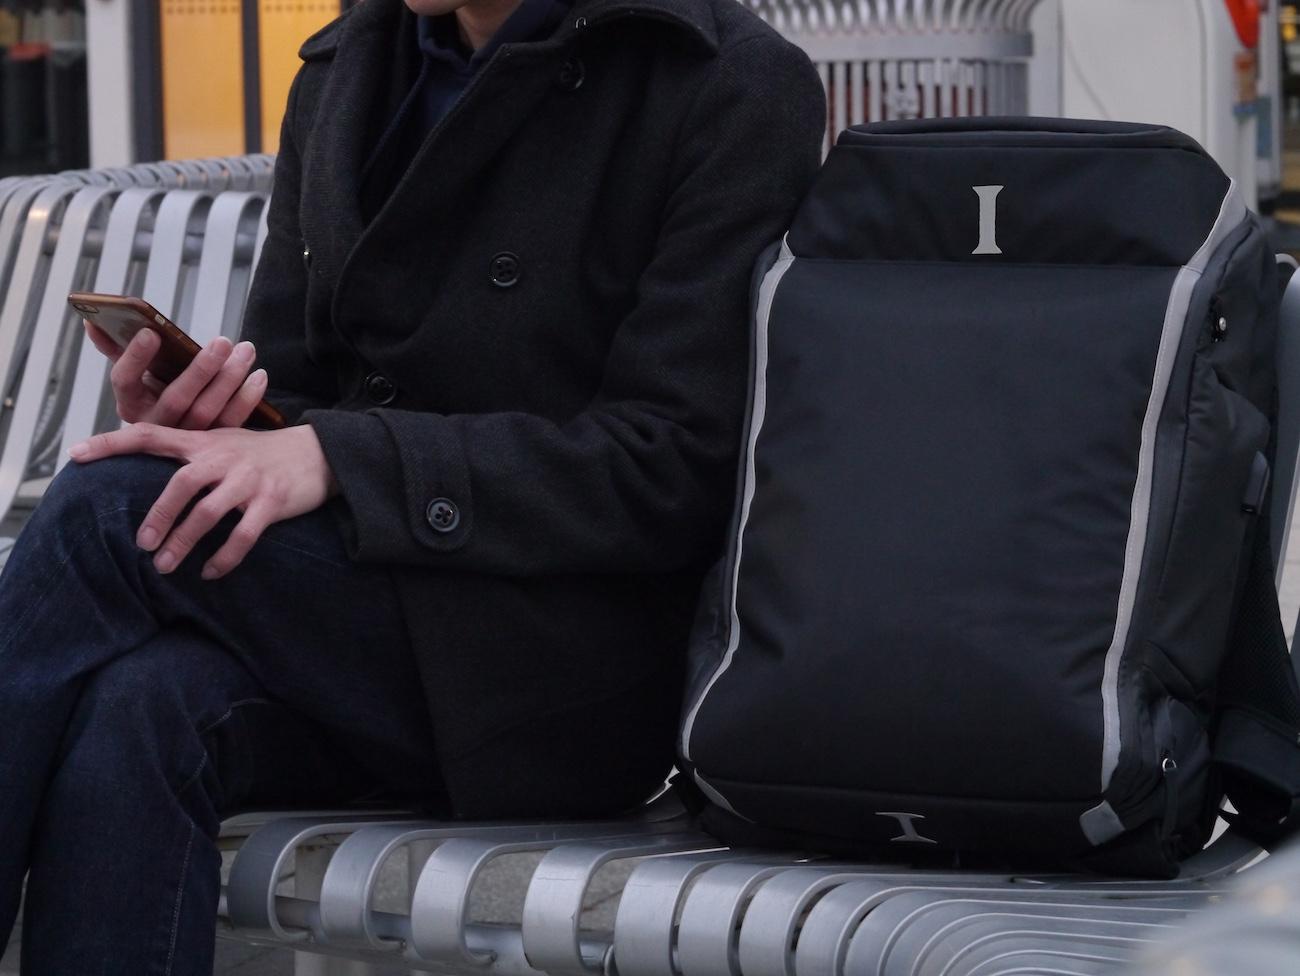 Instinct Modular Packing System Backpack